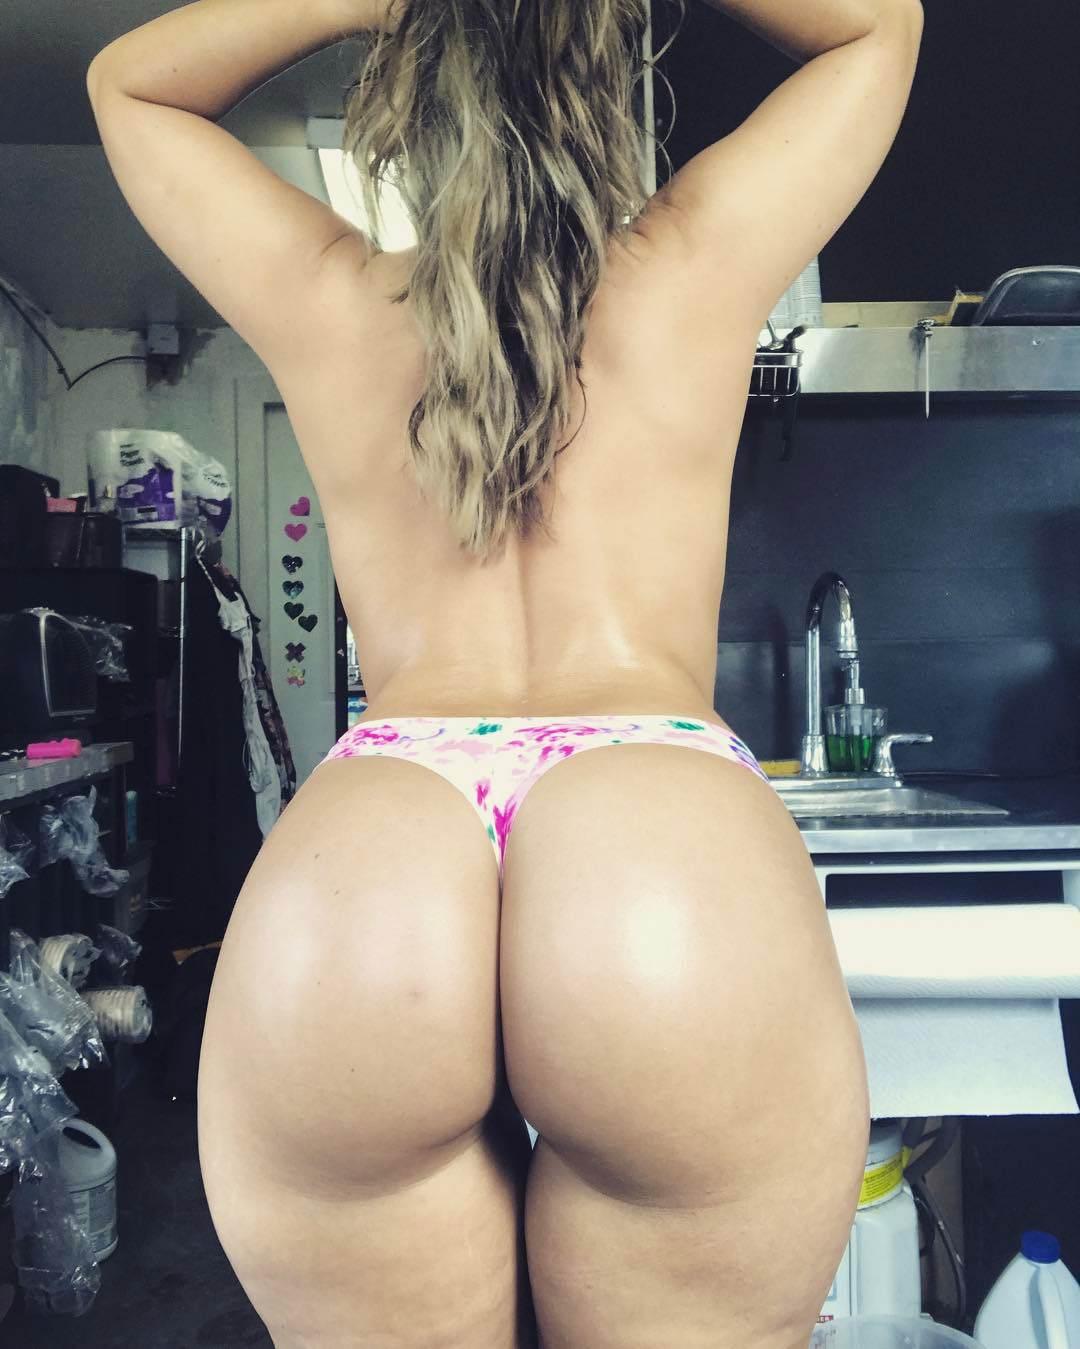 Big ass check